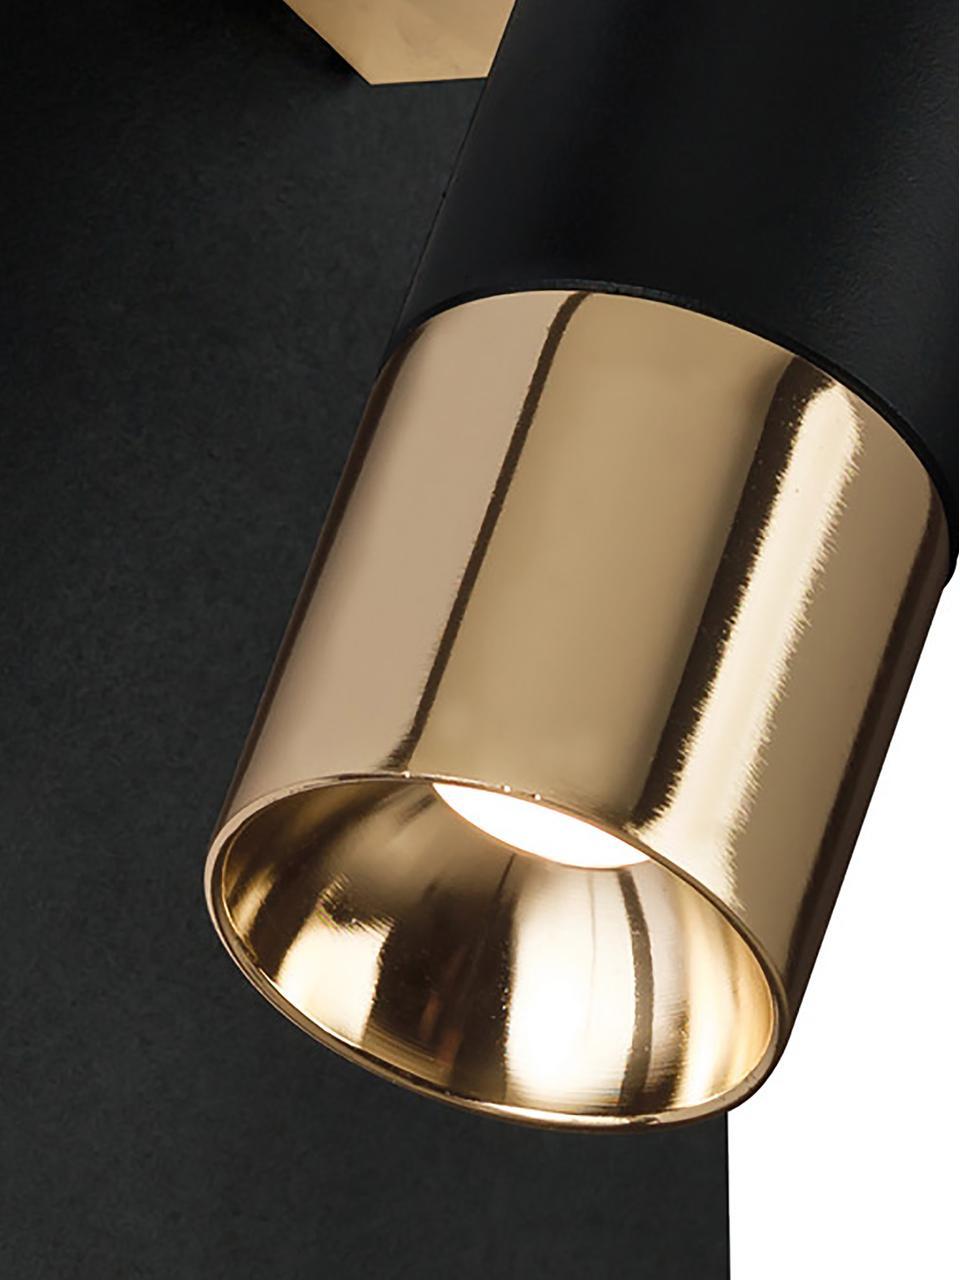 LED-Wandstrahler Bobby, Gestell: Metall, Lampenschirm: Metall, Schwarz,Goldfarben, 7 x 15 cm